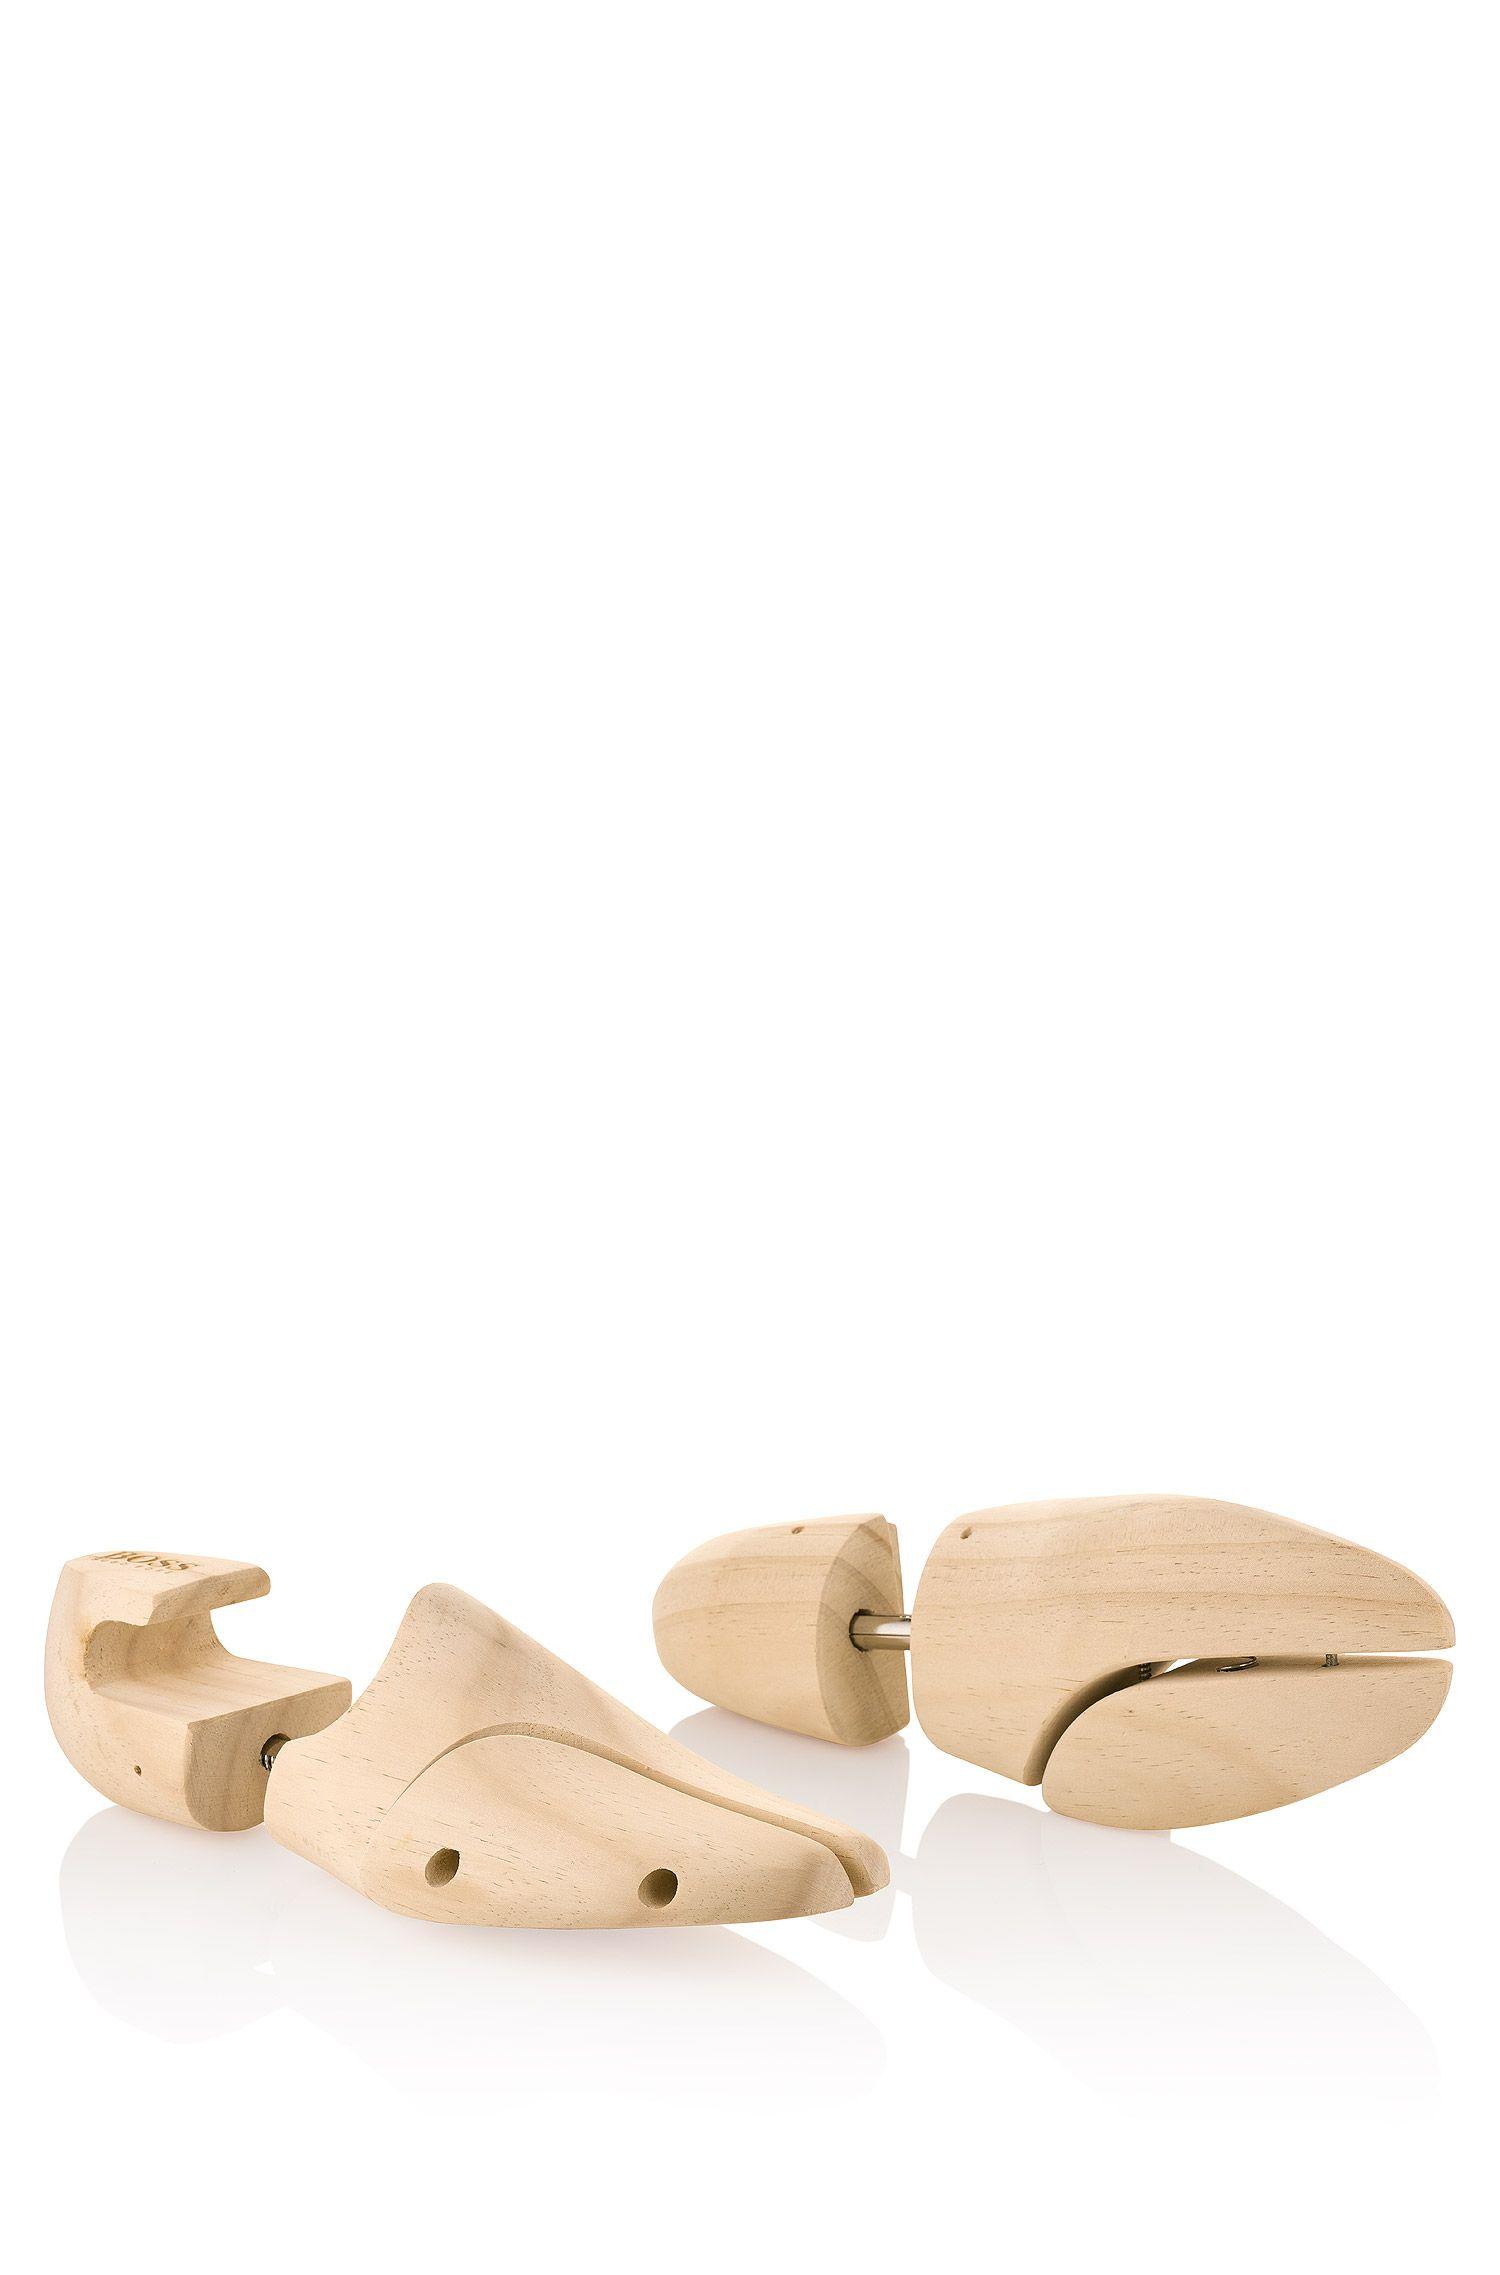 Schuhspanner ´SHOETREE` aus Kiefernholz